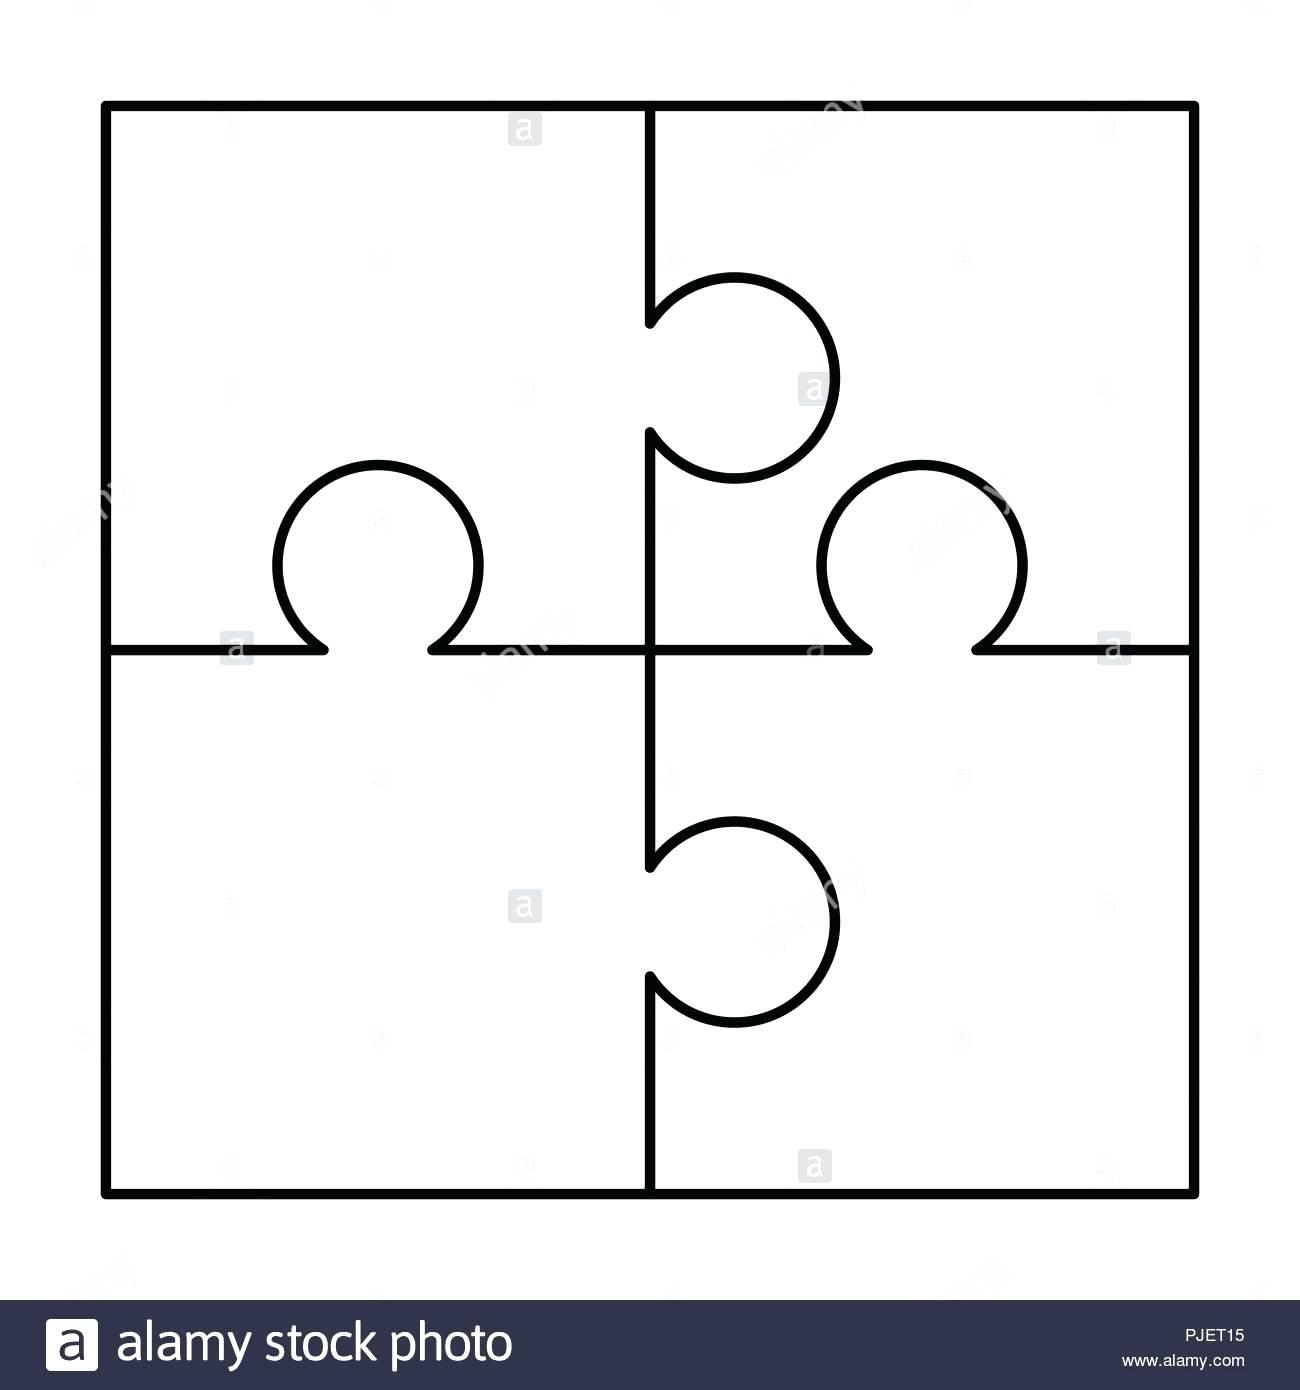 Printable Puzzles Pieces - Yapis.sticken.co - Printable Jigsaw Puzzles Pdf